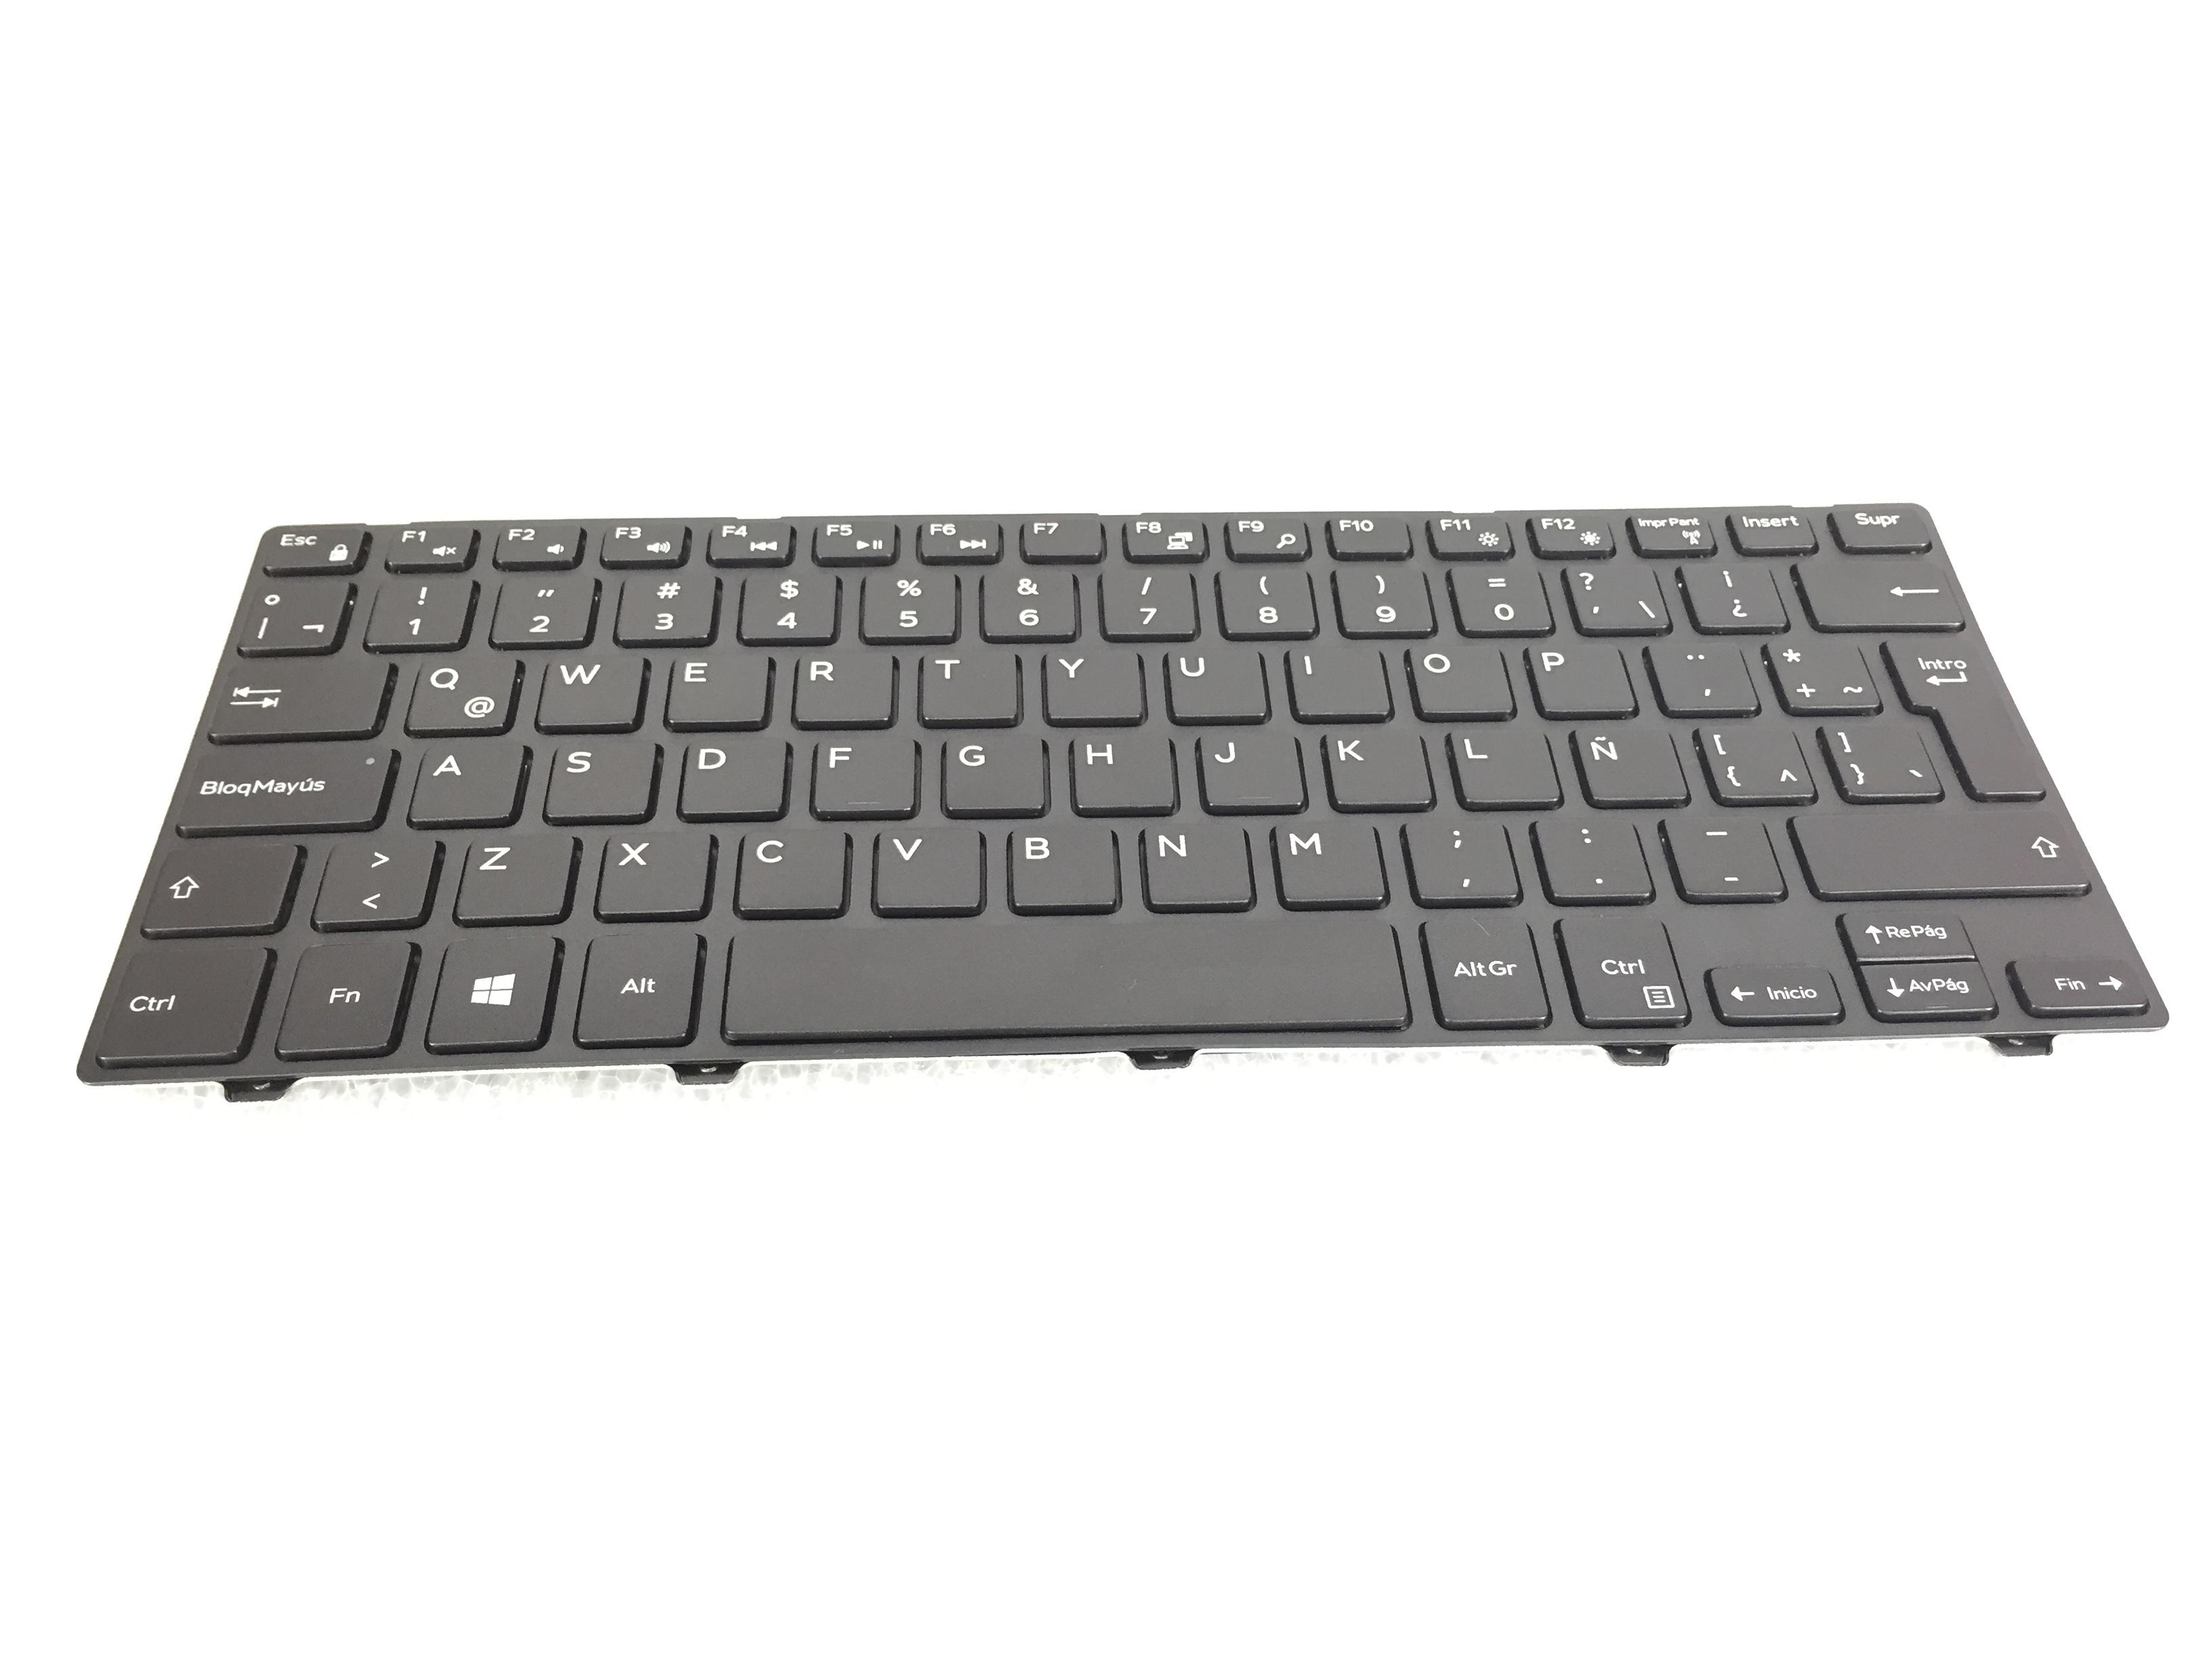 Dell Inspirion 14 3442 5451 5455 5458 Laptop Keyboard (0TCKCW)